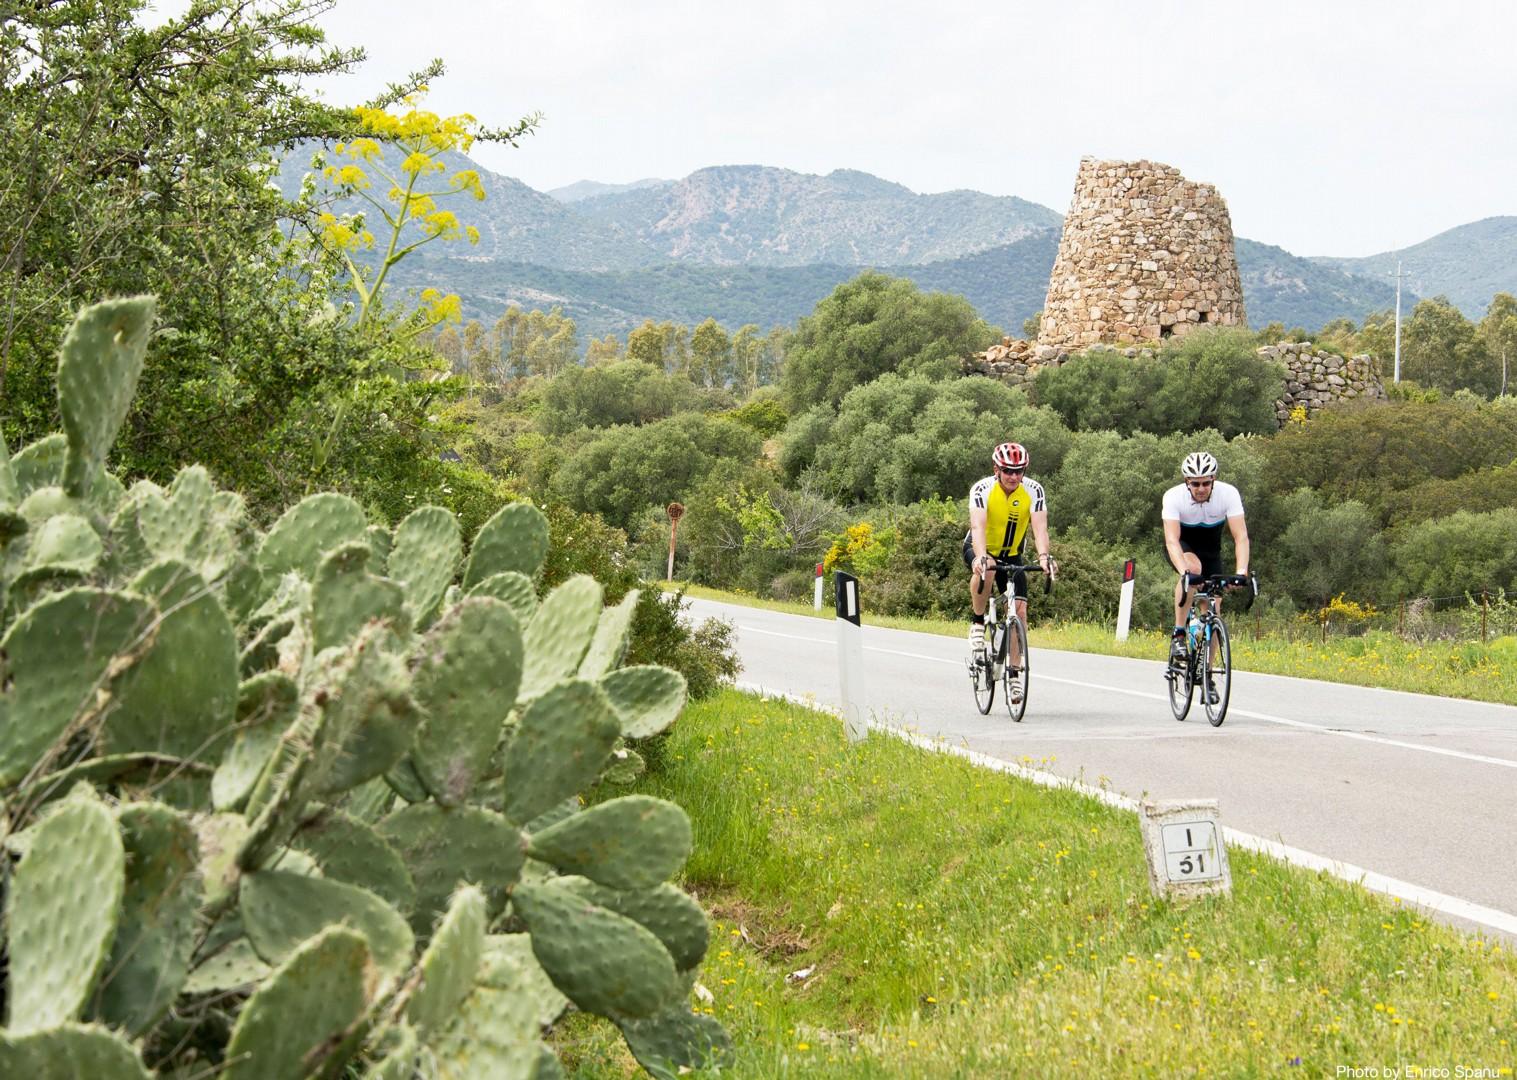 Sardinian-Cycling-Holiday-Road-Sardinian-Mountains.jpg - Italy - Sardinia - Sardinian Mountains - Guided Road Cycling Holiday - Road Cycling